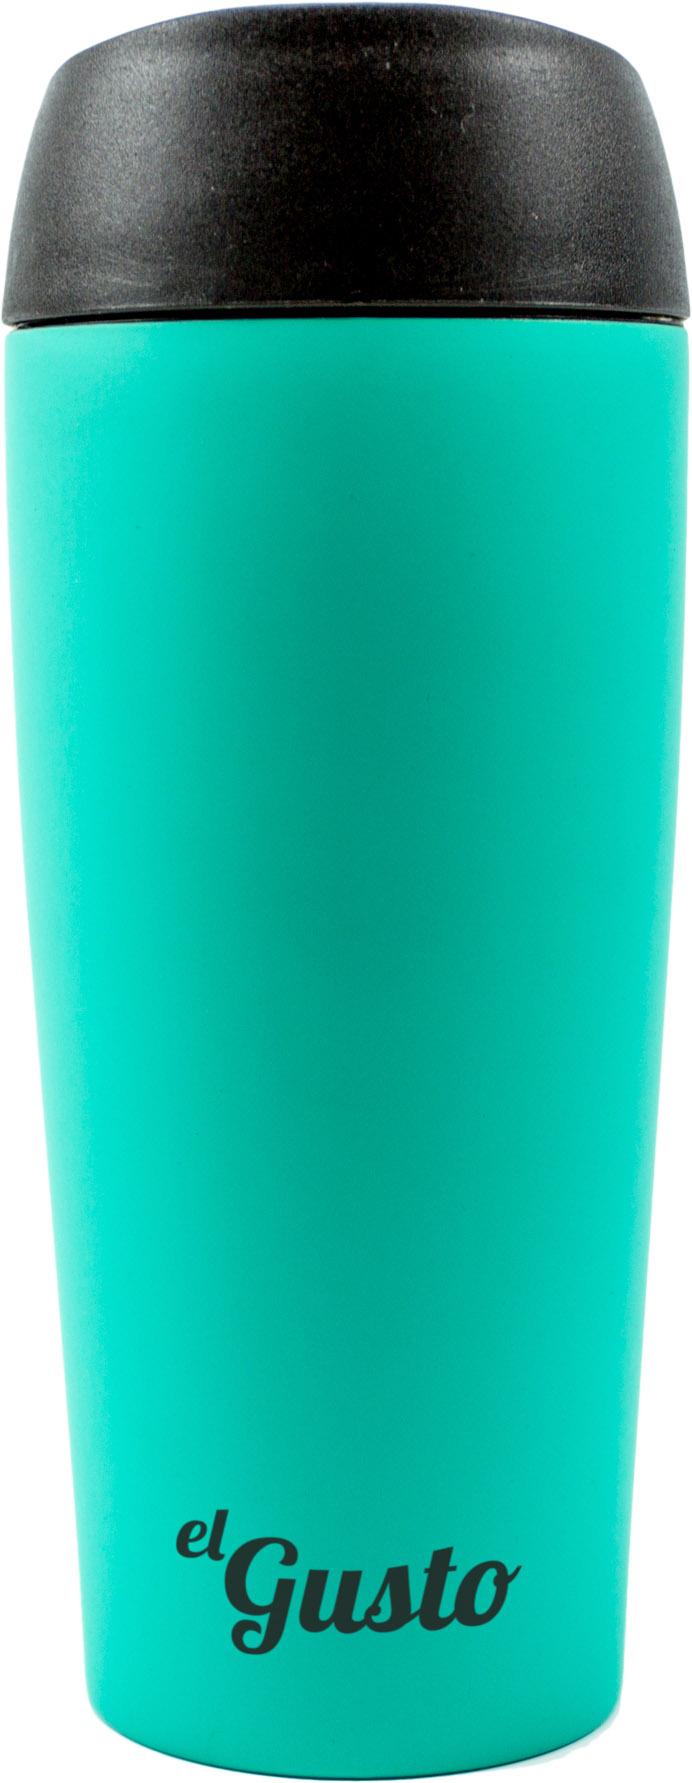 El Gusto Grano 0.47 л (110M) - термокружка (Mint) термокружка el gusto grano 470ml peach 110p